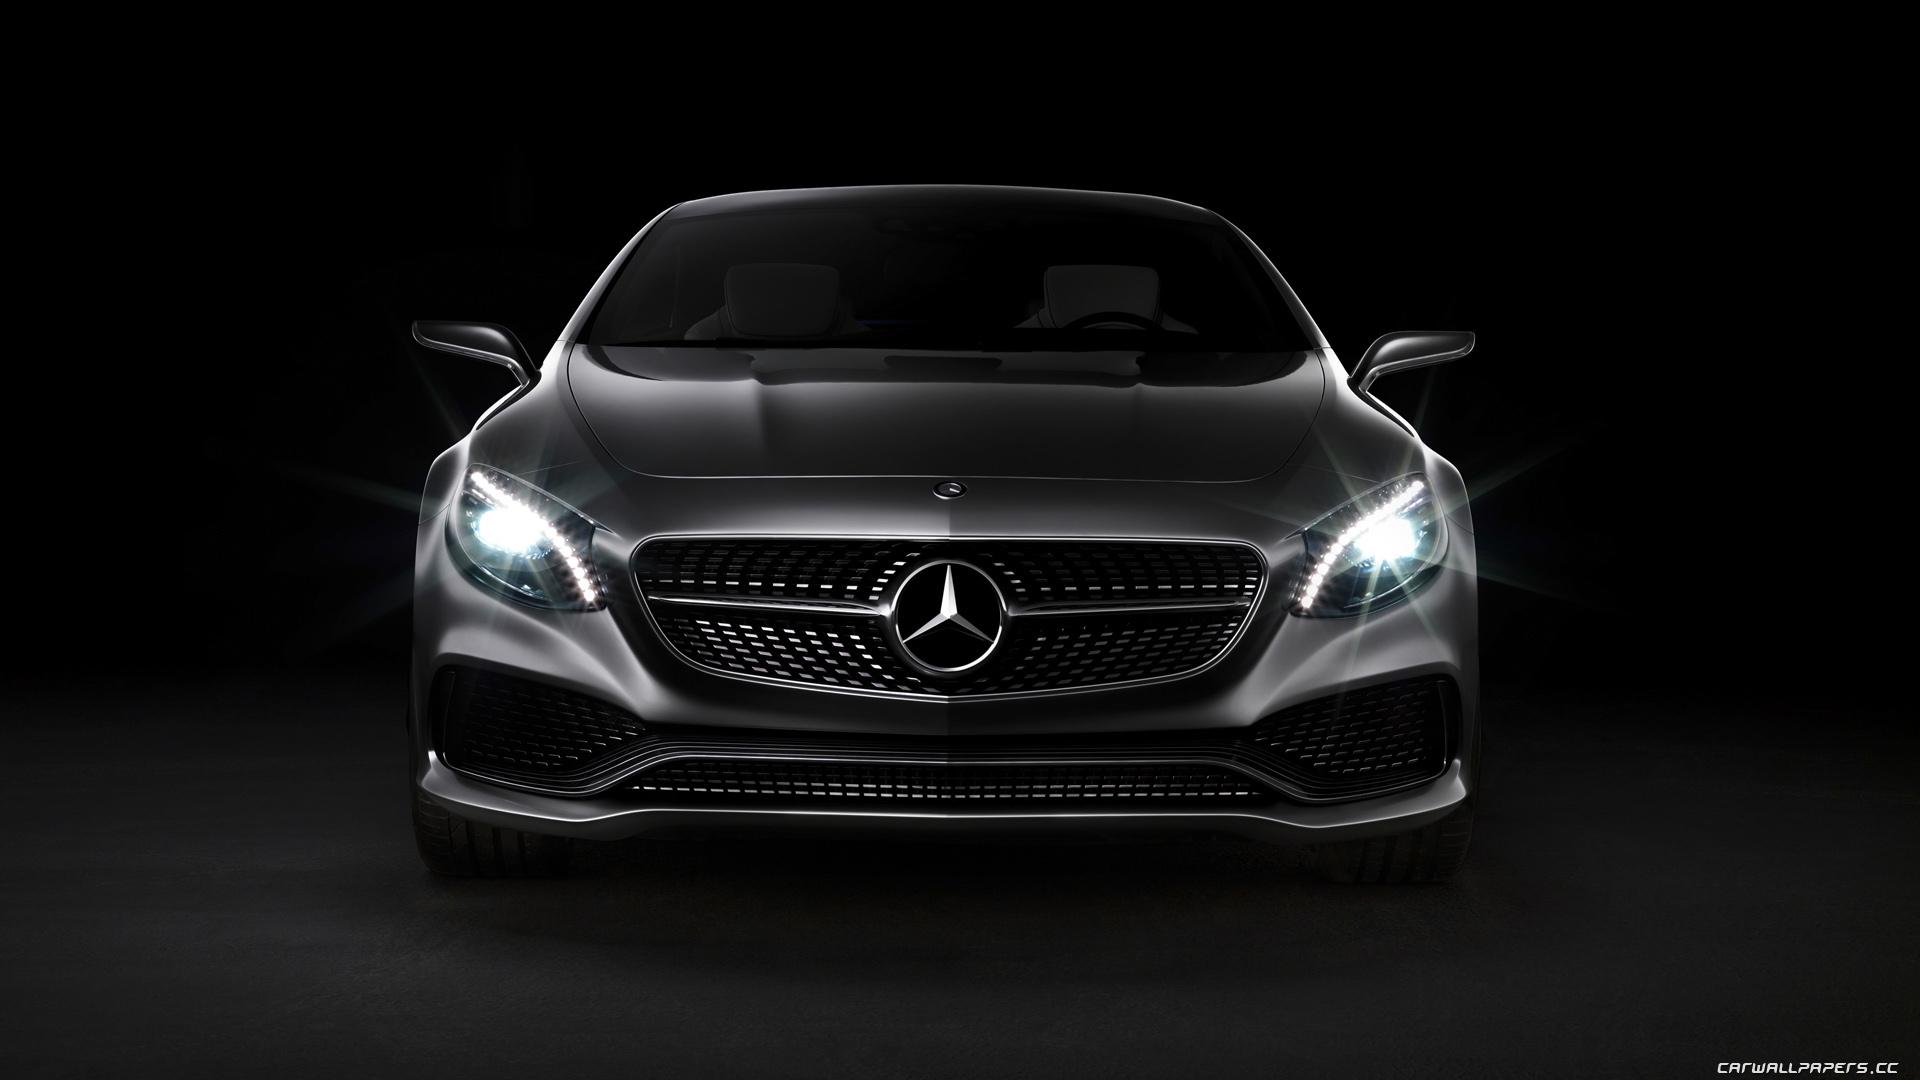 Mercedes C180 2017 >> Mercedes Wallpaper (30 Wallpapers) – Adorable Wallpapers